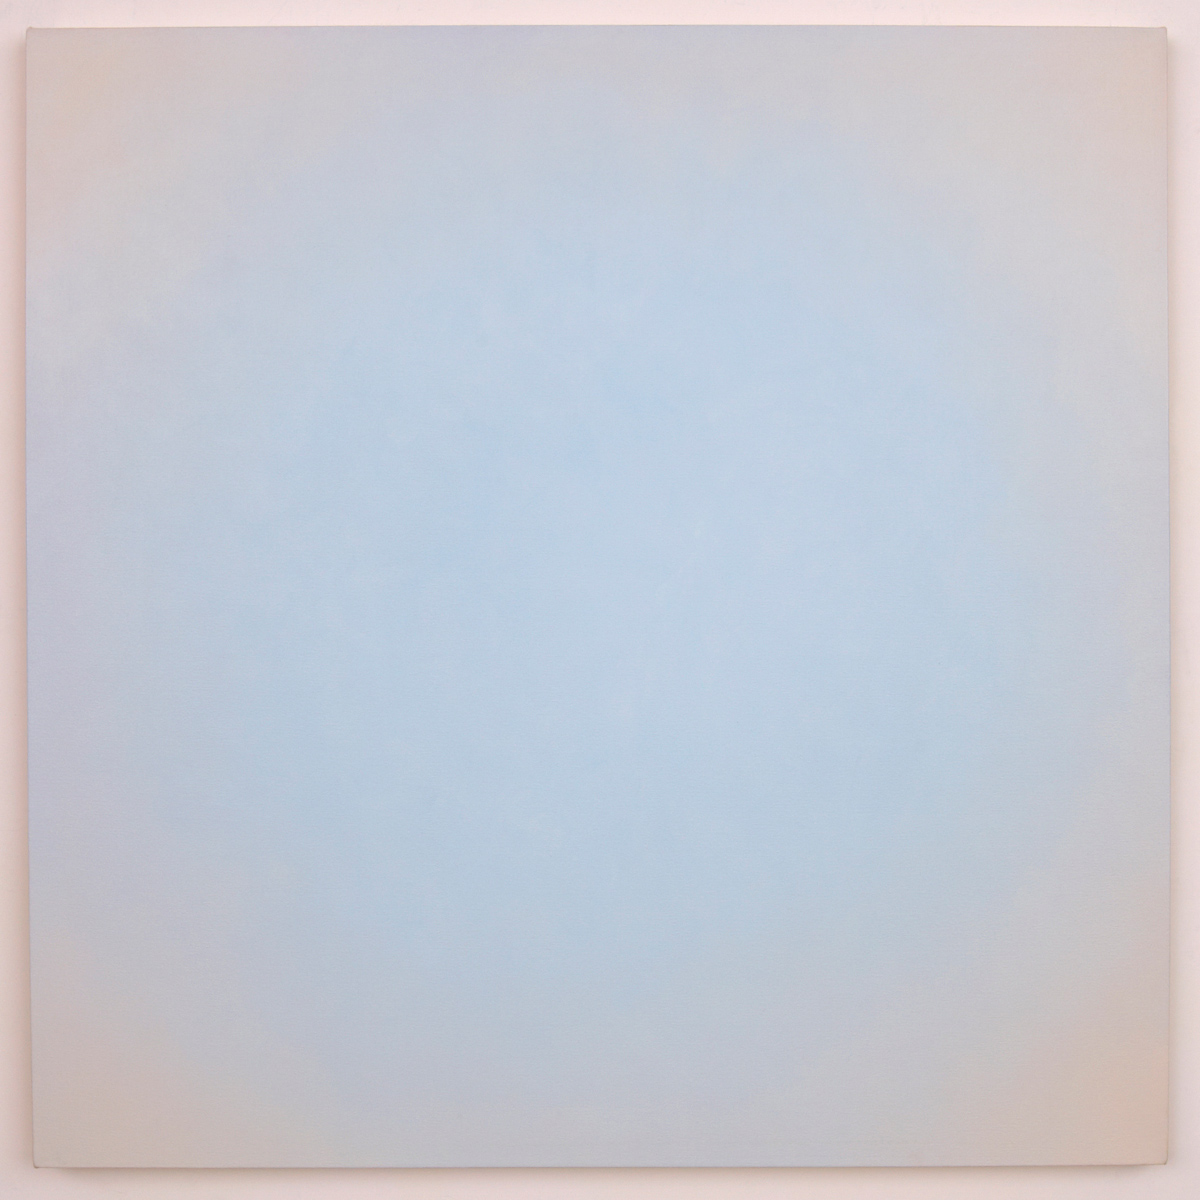 Blue Orange #10 (White/Orange), Equivalence Blue Orange Series, 2006, oil on canvas, 30 x 30 in. (76 x 76 cm.)